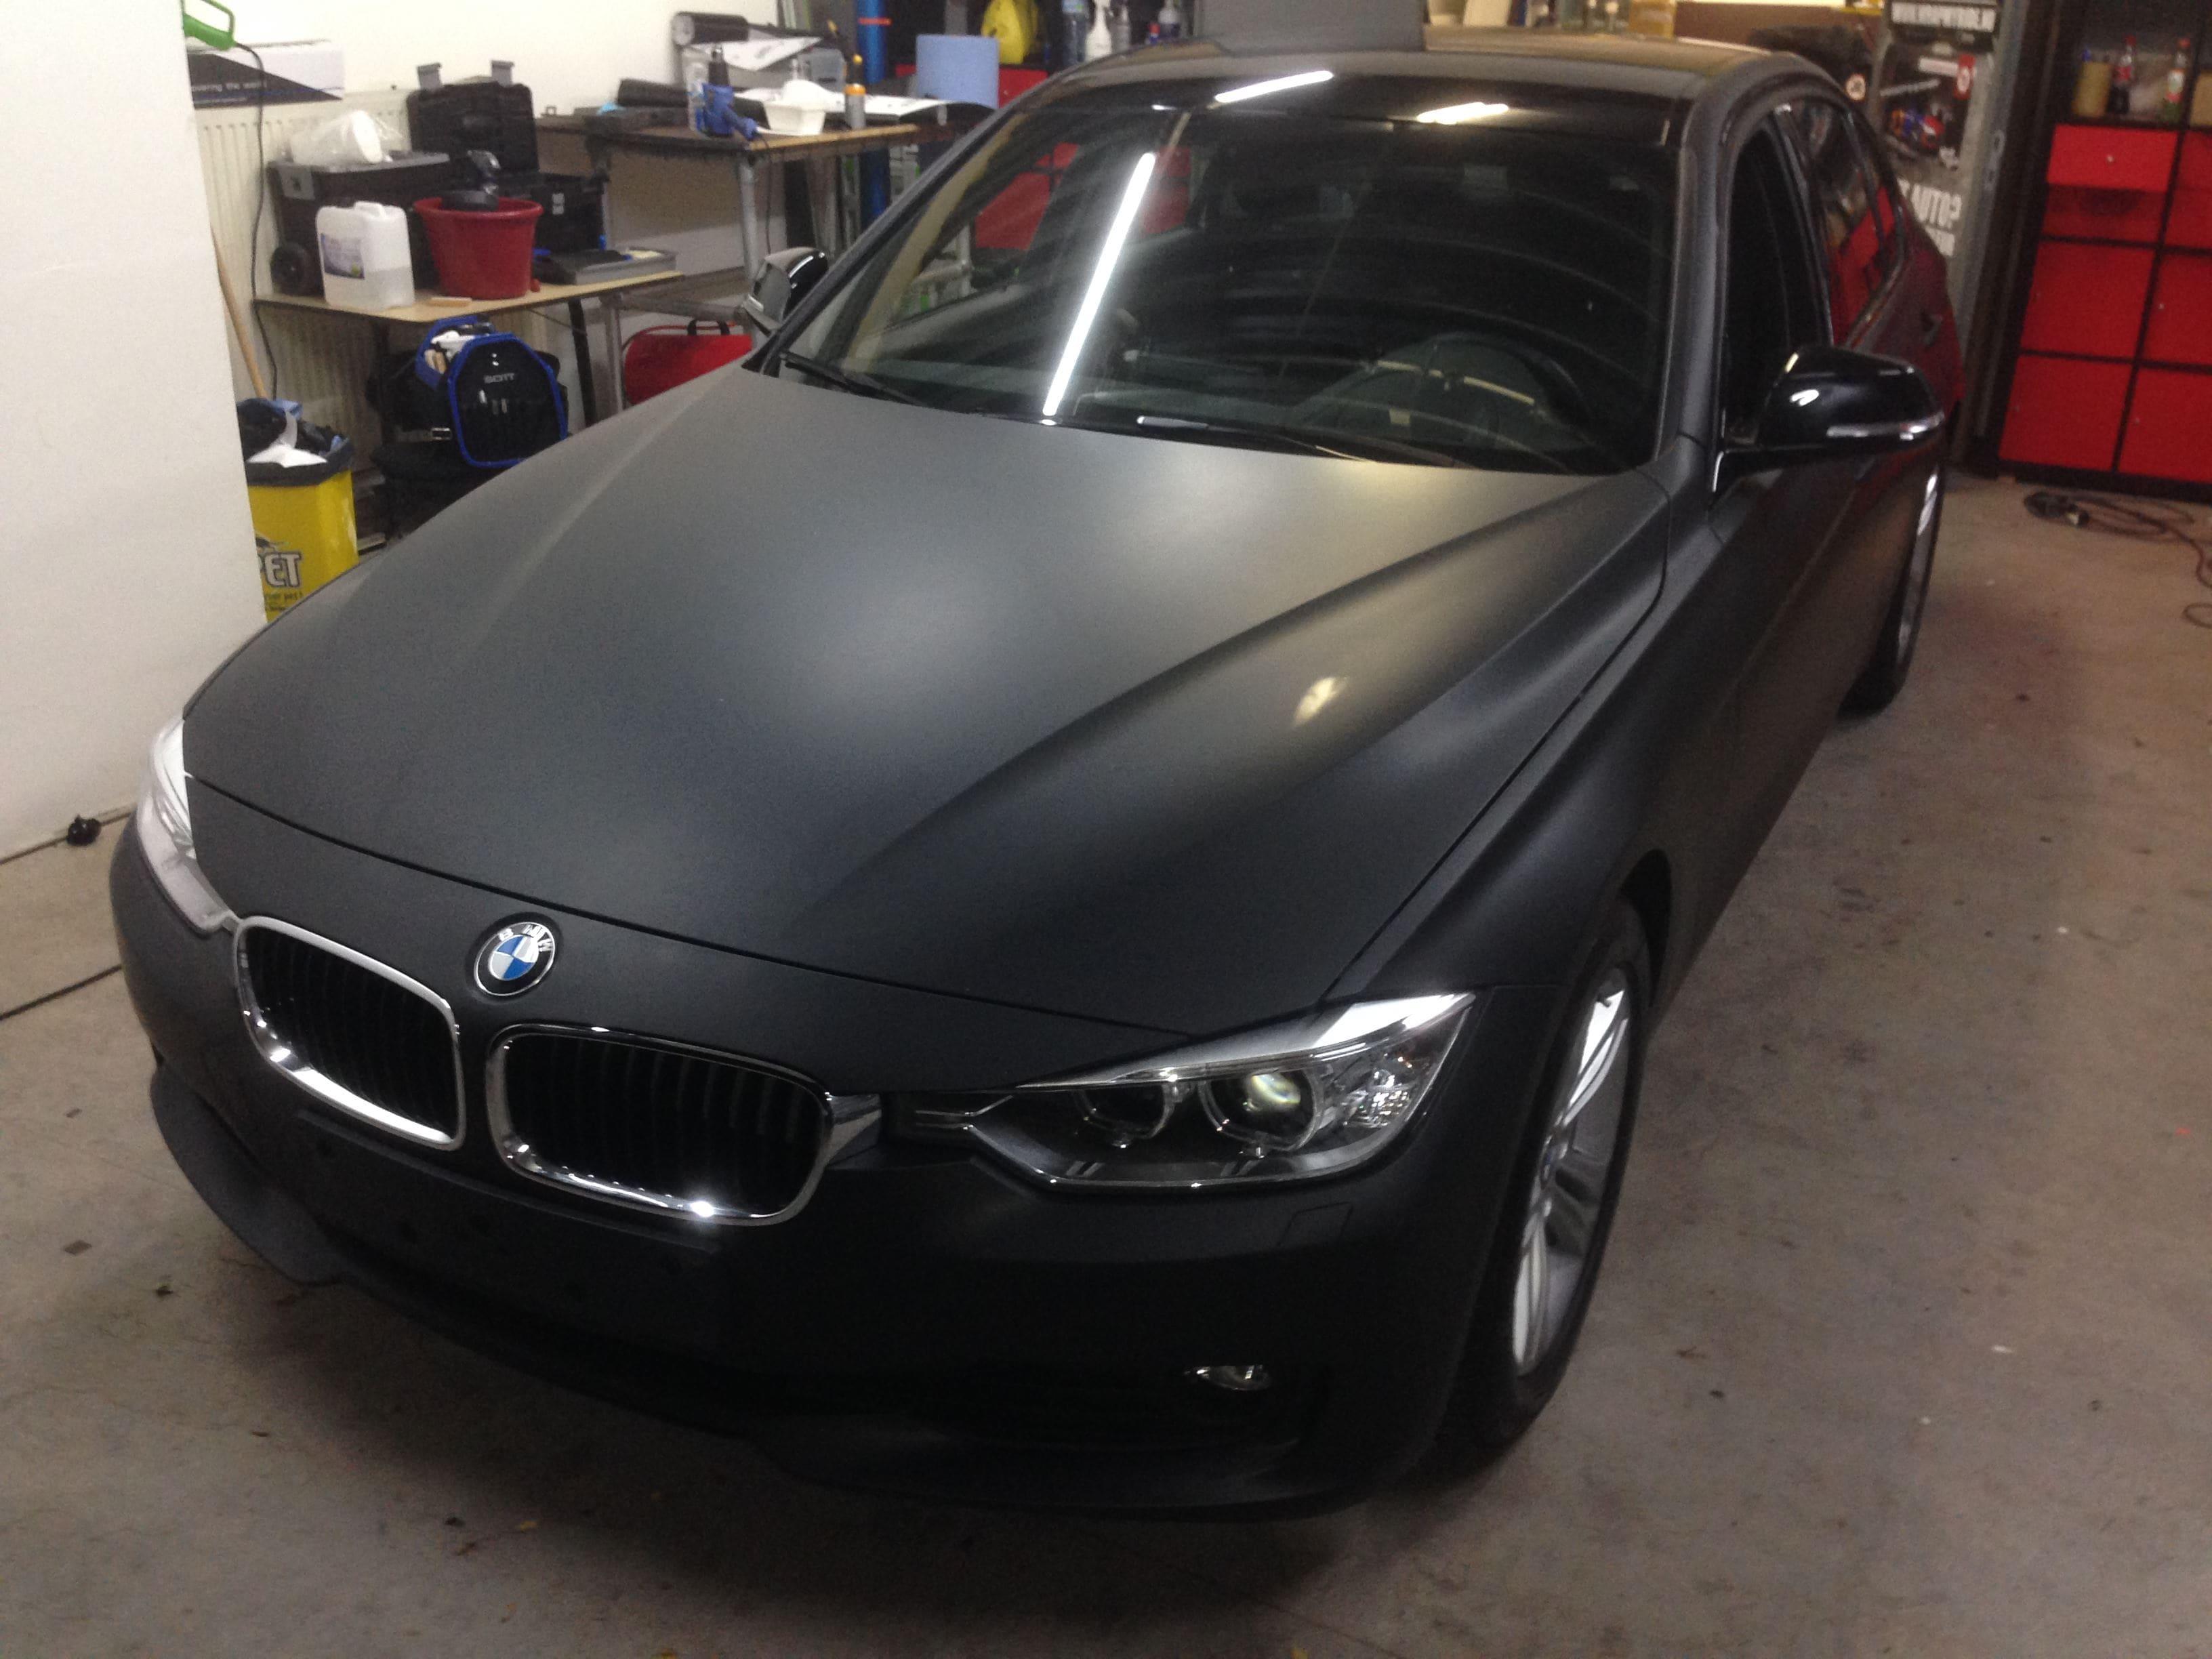 BMW E92 3 Serie met Mat Zwarte Wrap, Carwrapping door Wrapmyride.nu Foto-nr:5414, ©2020